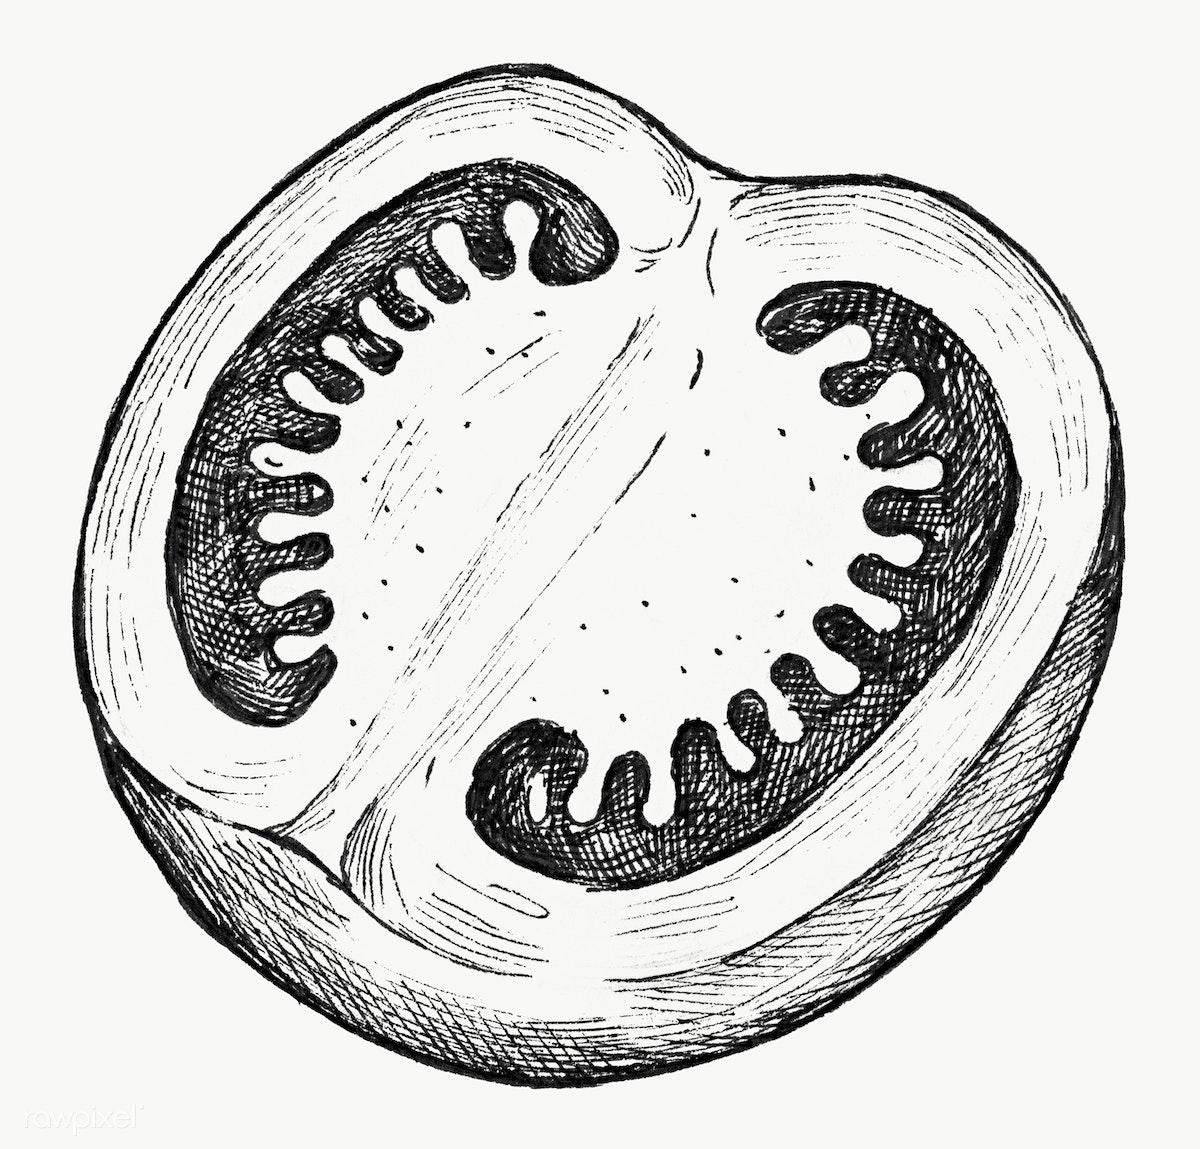 Half tomato ink drawing | Free stock illustration - 1200283